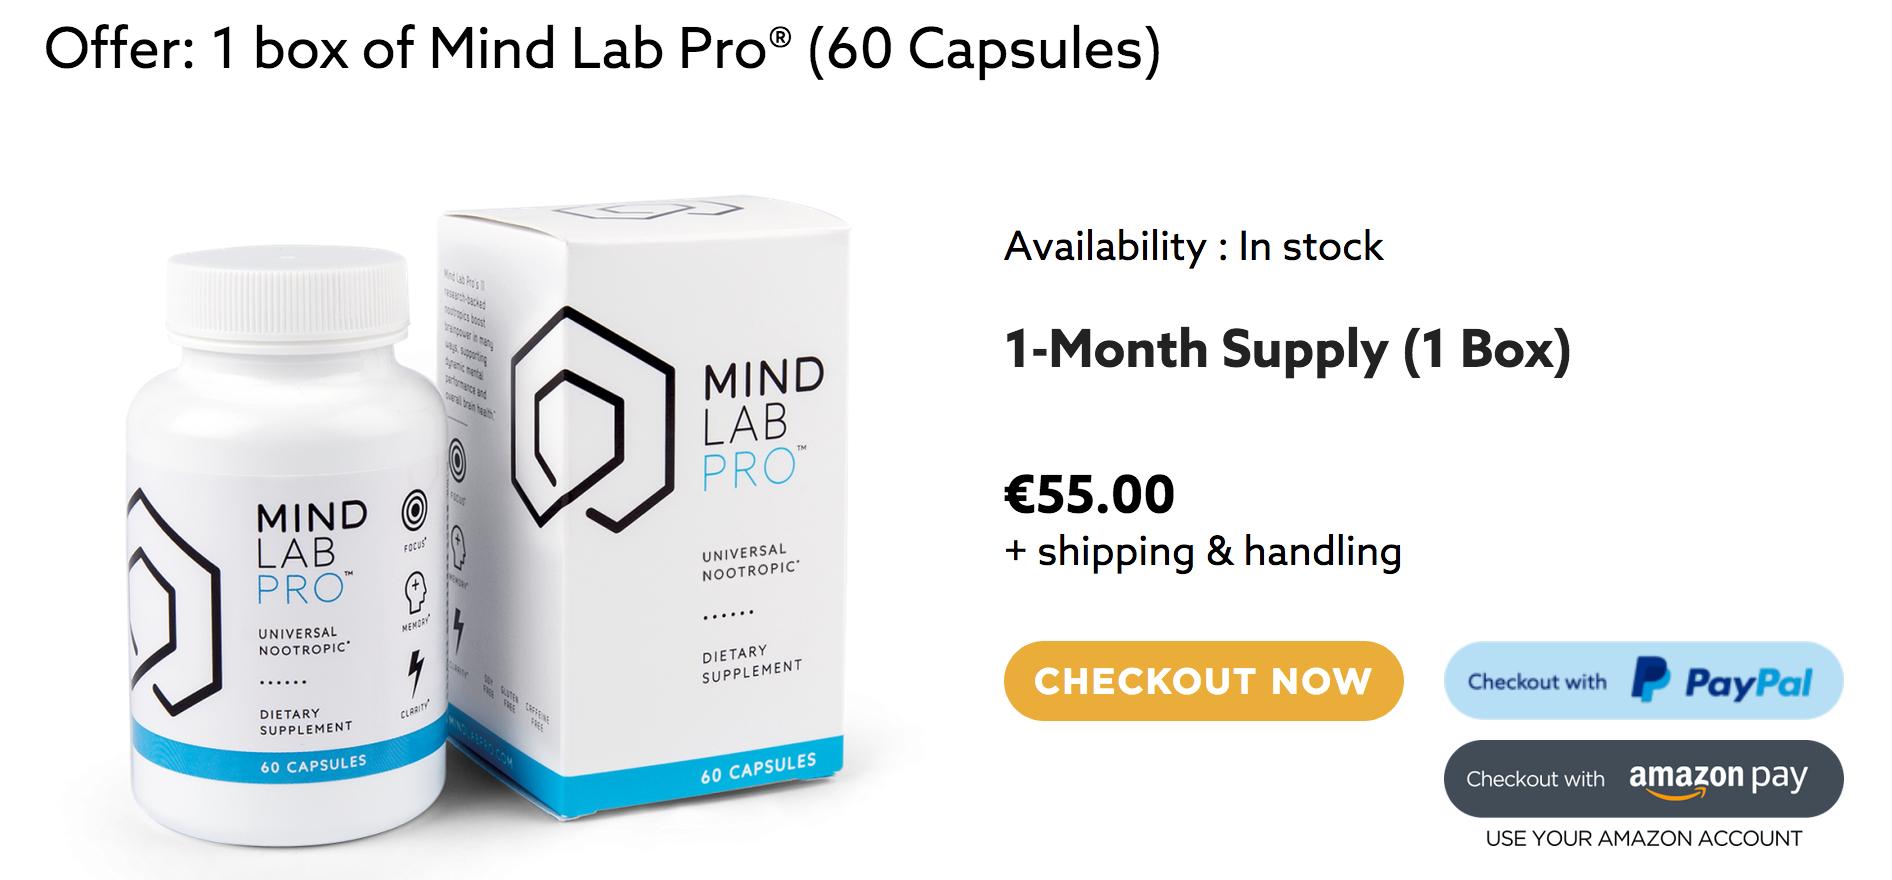 MindLab Pro Review, MindLab Pro supplementbuyer, MindLab pro scam, MindLab Pro review, mindlab pro, MindLab Pro Price, MindLab Pro Serving